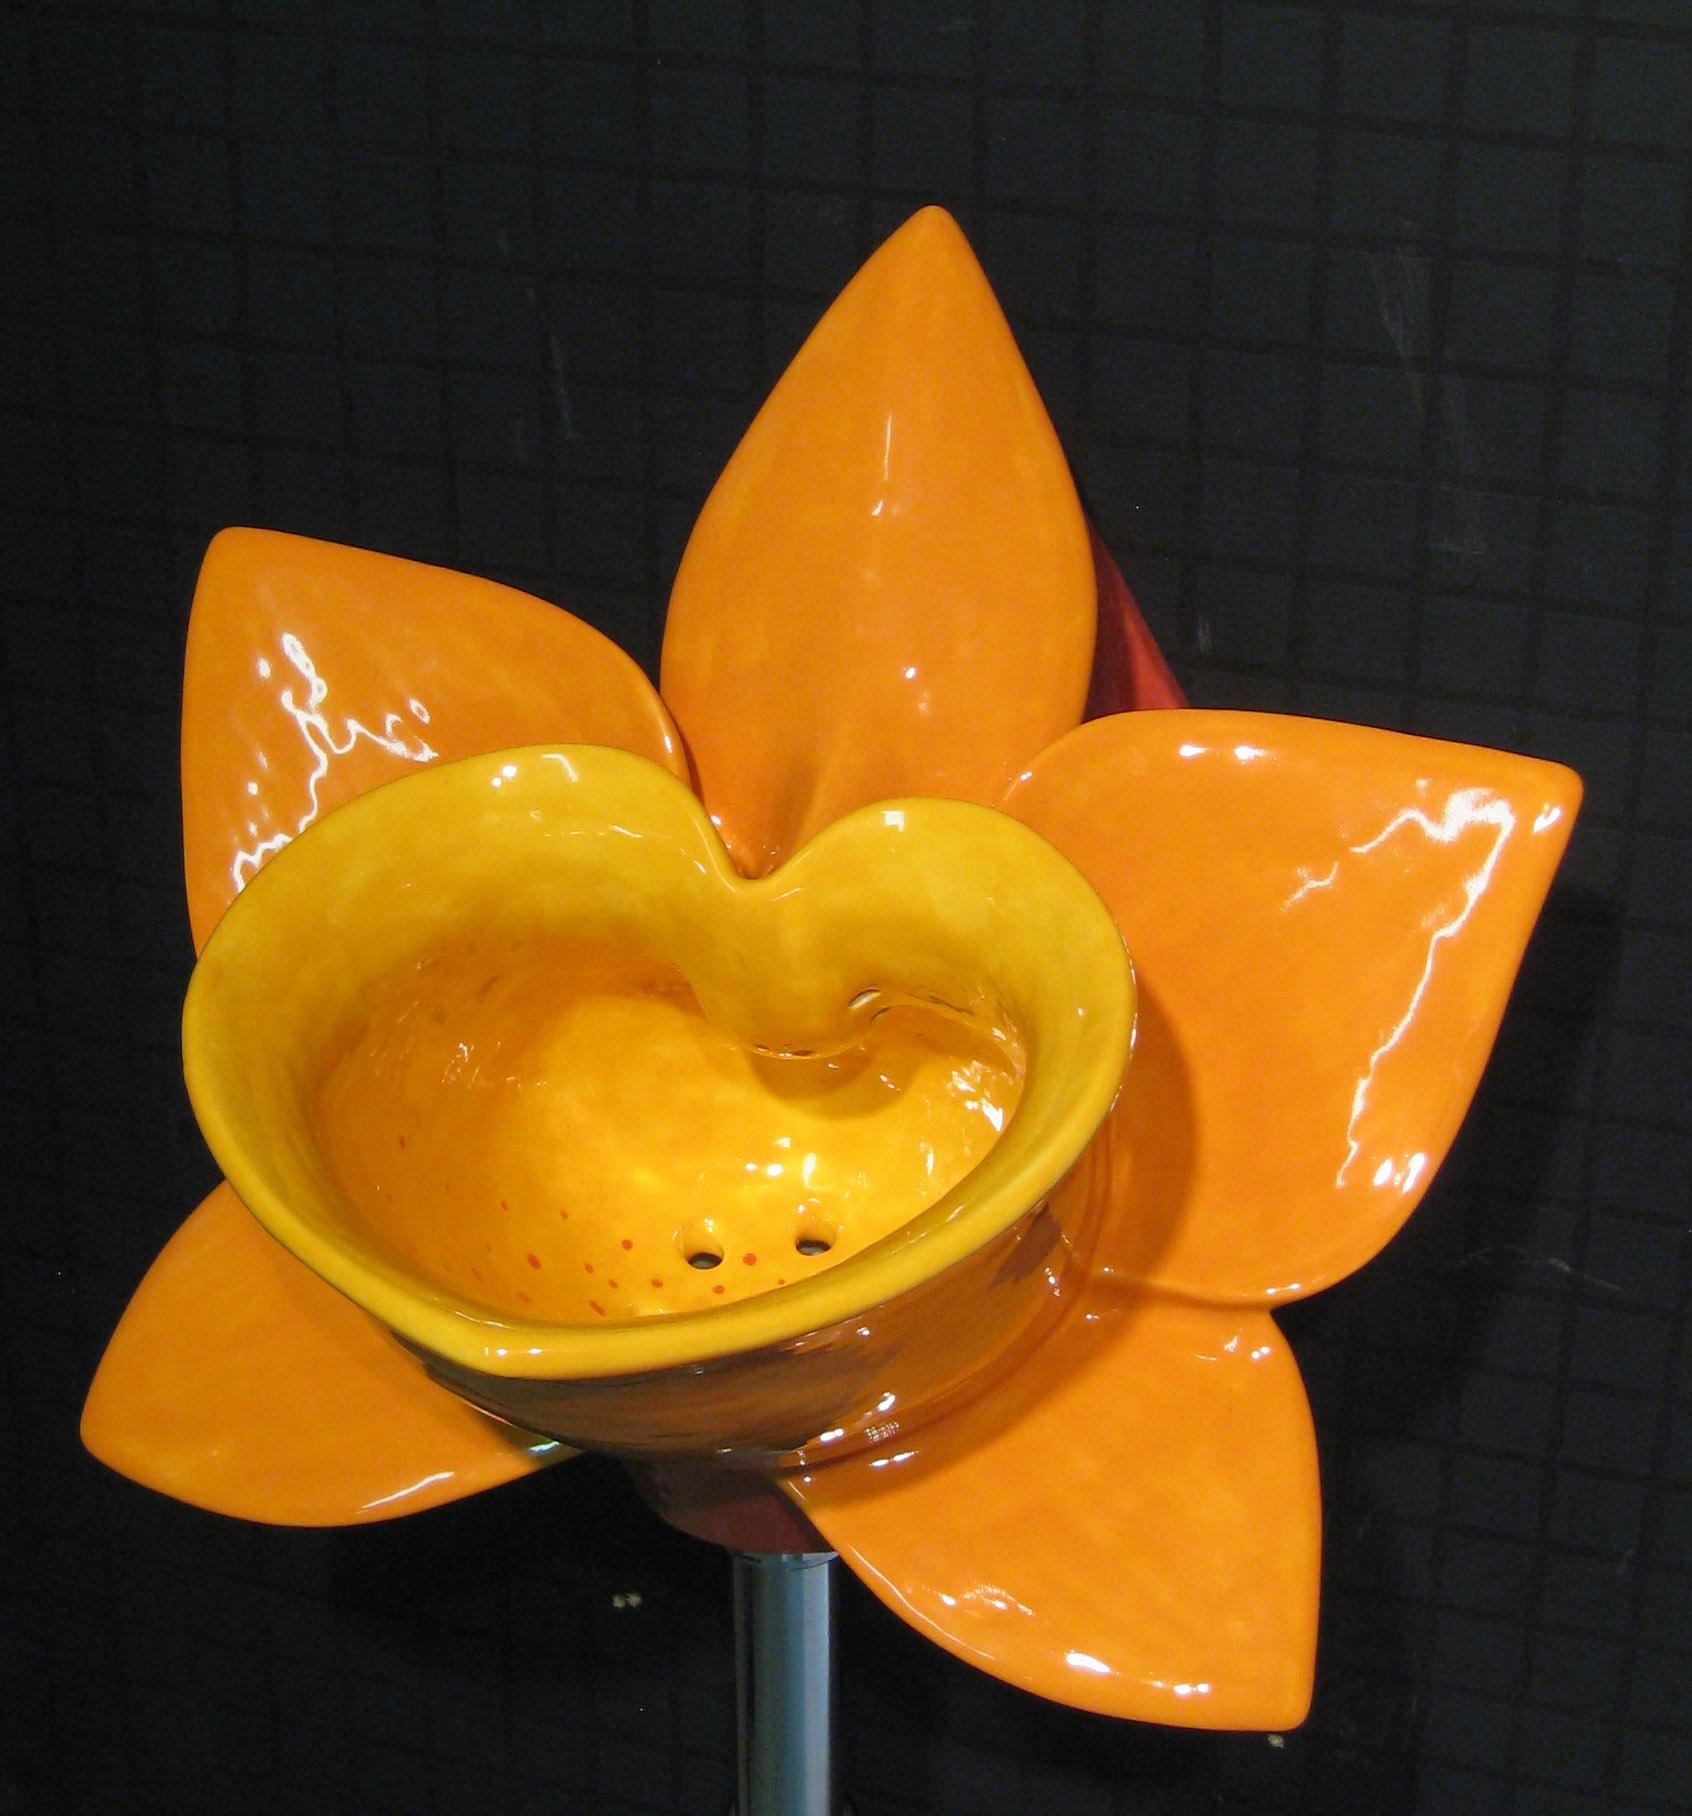 http://www.clarkmade.com/images%20urinals/orange%20orchid%20new%202.jpg